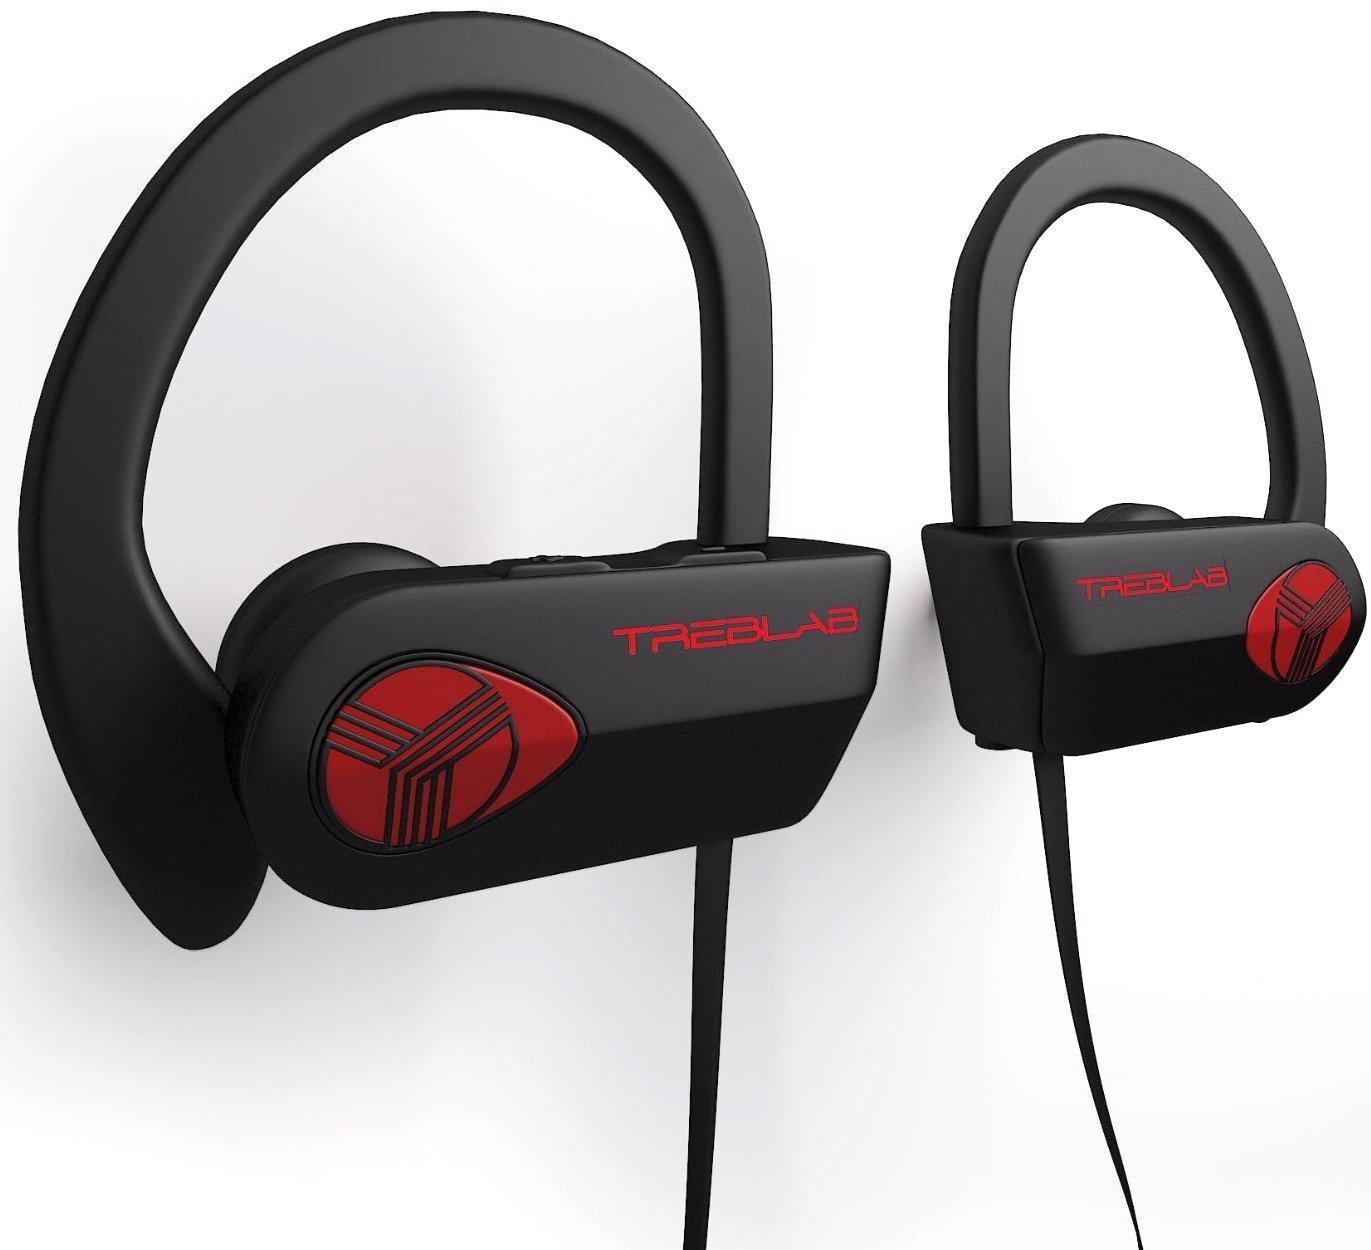 Earphones bluetooth wireless with mic - earphones with mic purple